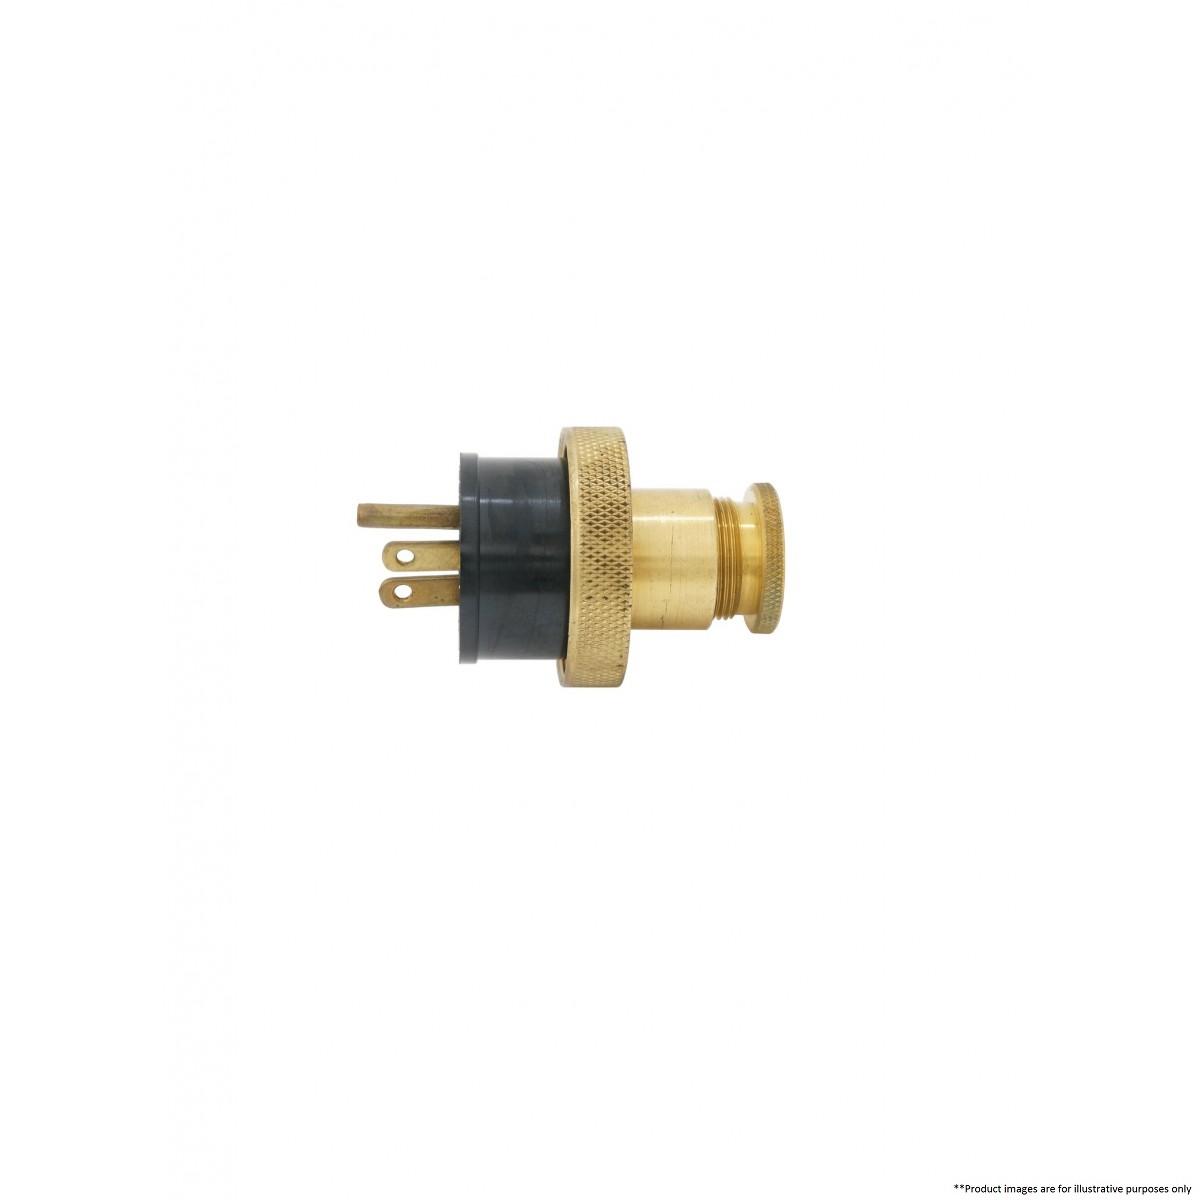 Pauluhn 2603bu 125 Marine Brass Plug Marine Electrical